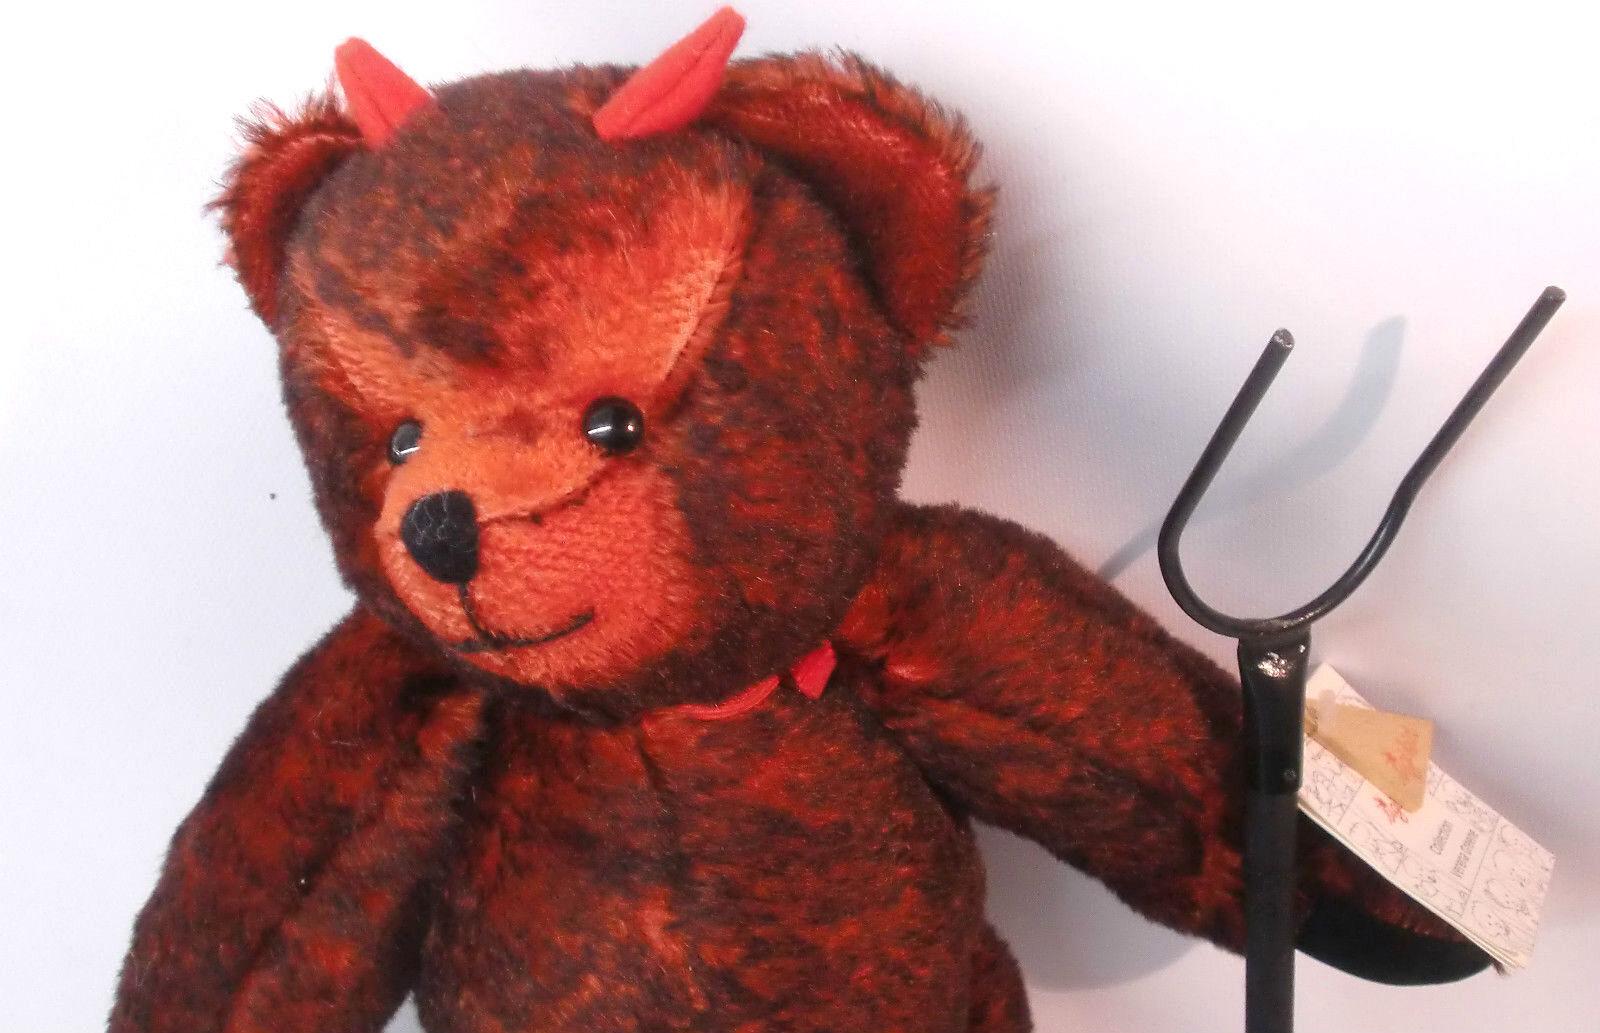 Teddy-Orso künstlerbär SIGIKID diavolo Limited Verena verdee n. 0026 DA COLLEZIONE Rar